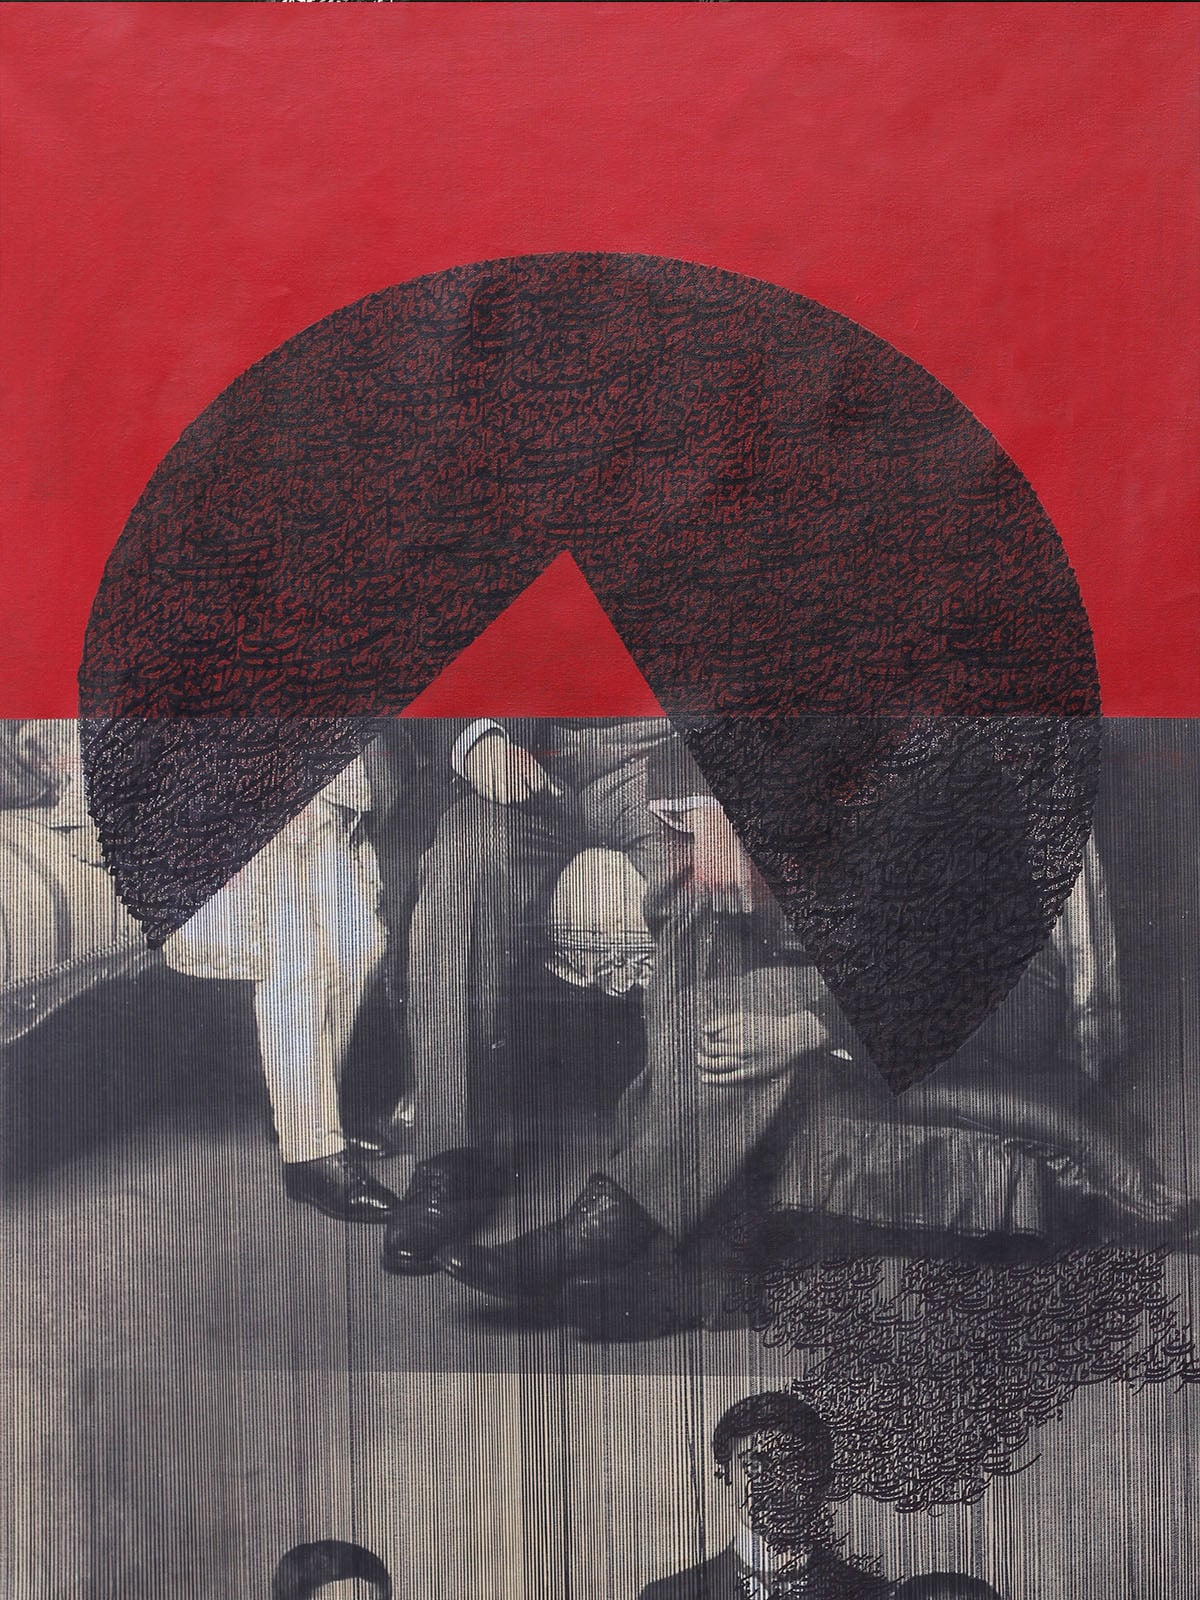 Muzzumil Ruheel's *Nowhere to Run*   Courtesy Grosvenor Gallery